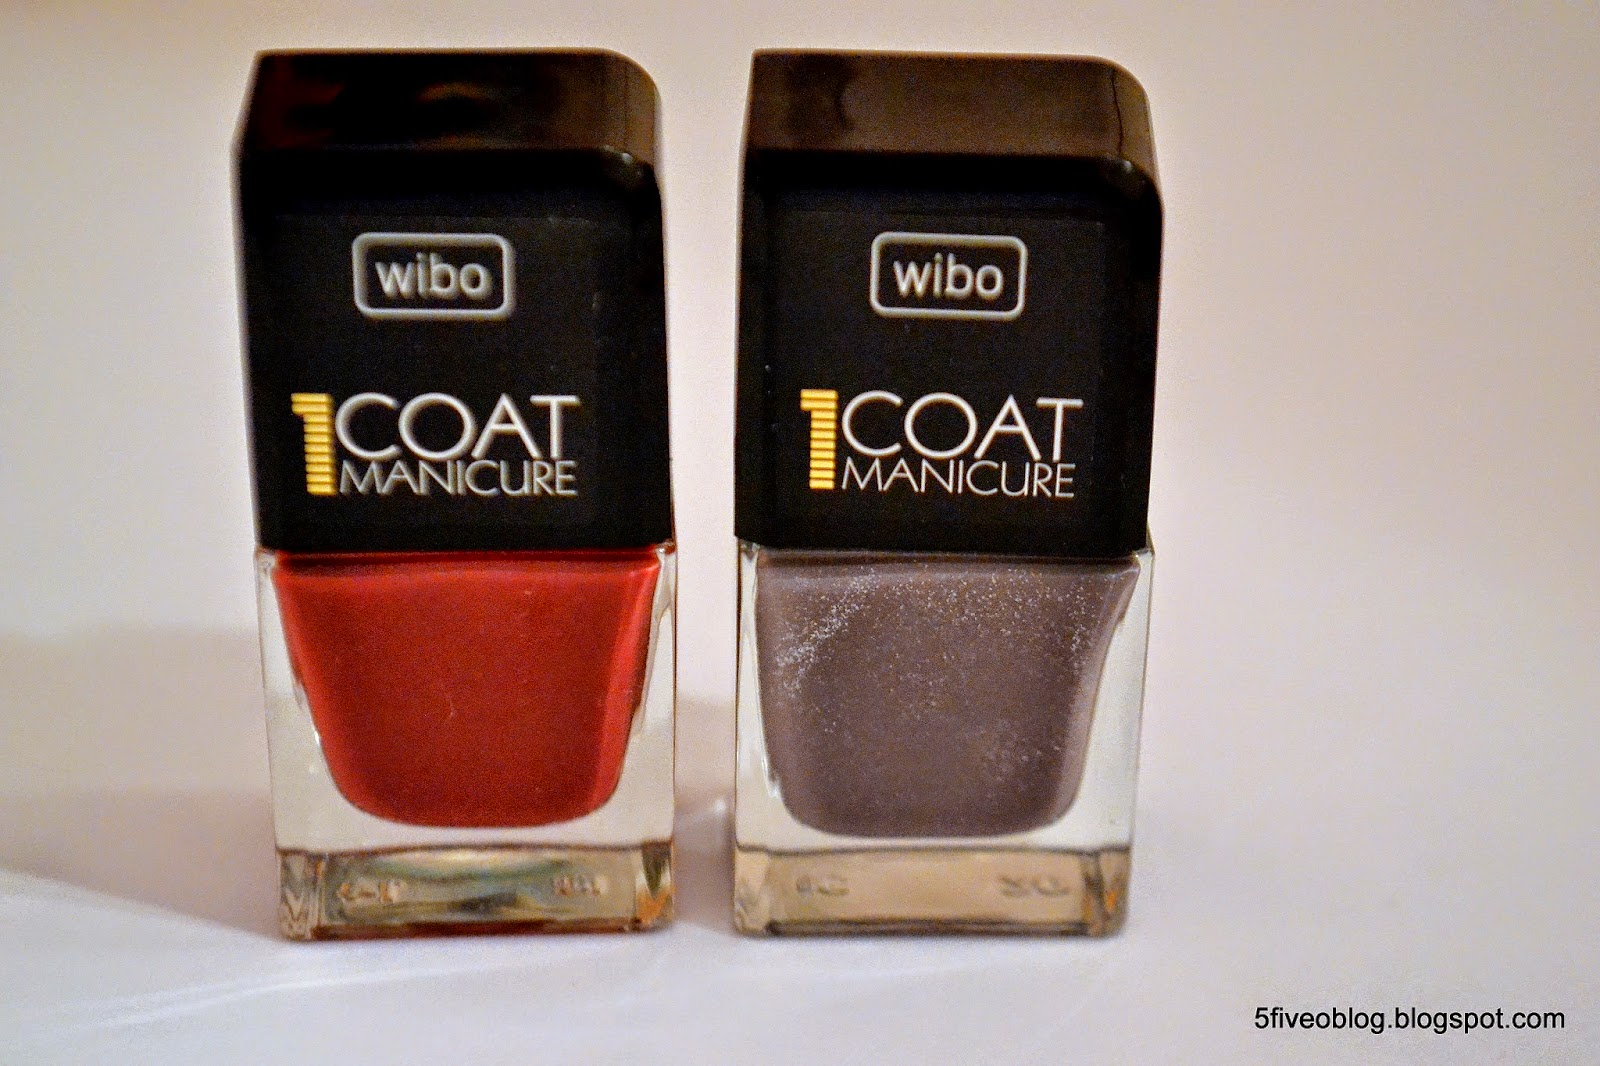 Wibo - 1 Coat Manicure.